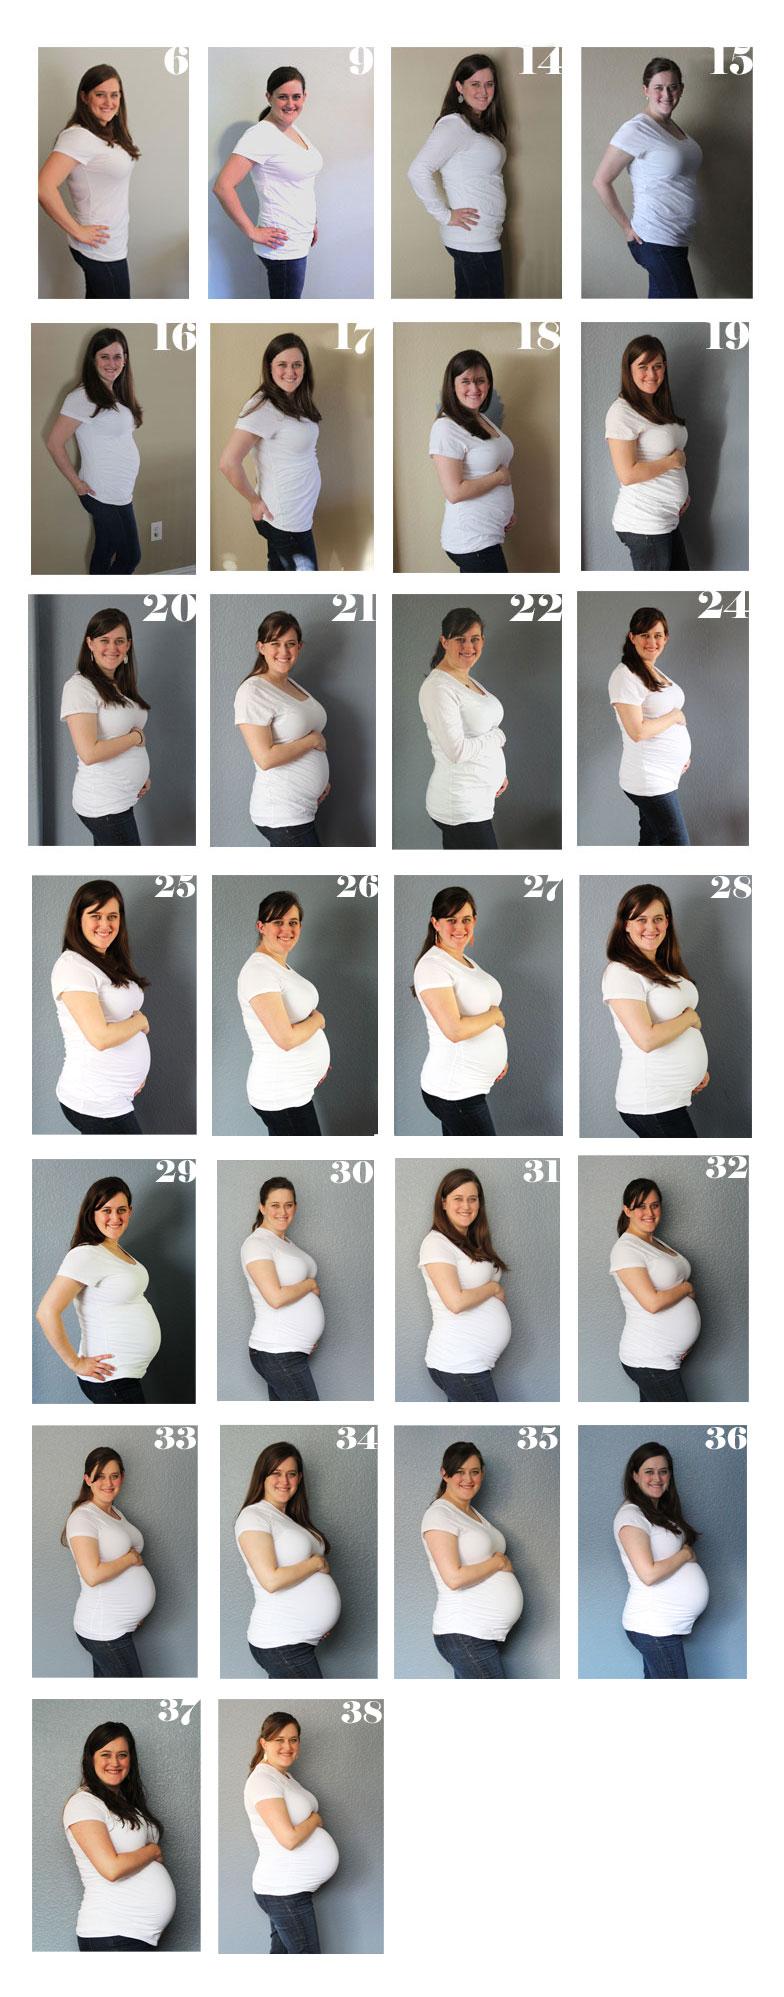 Weekly Pregnancy Chart | www.amusingmj.com